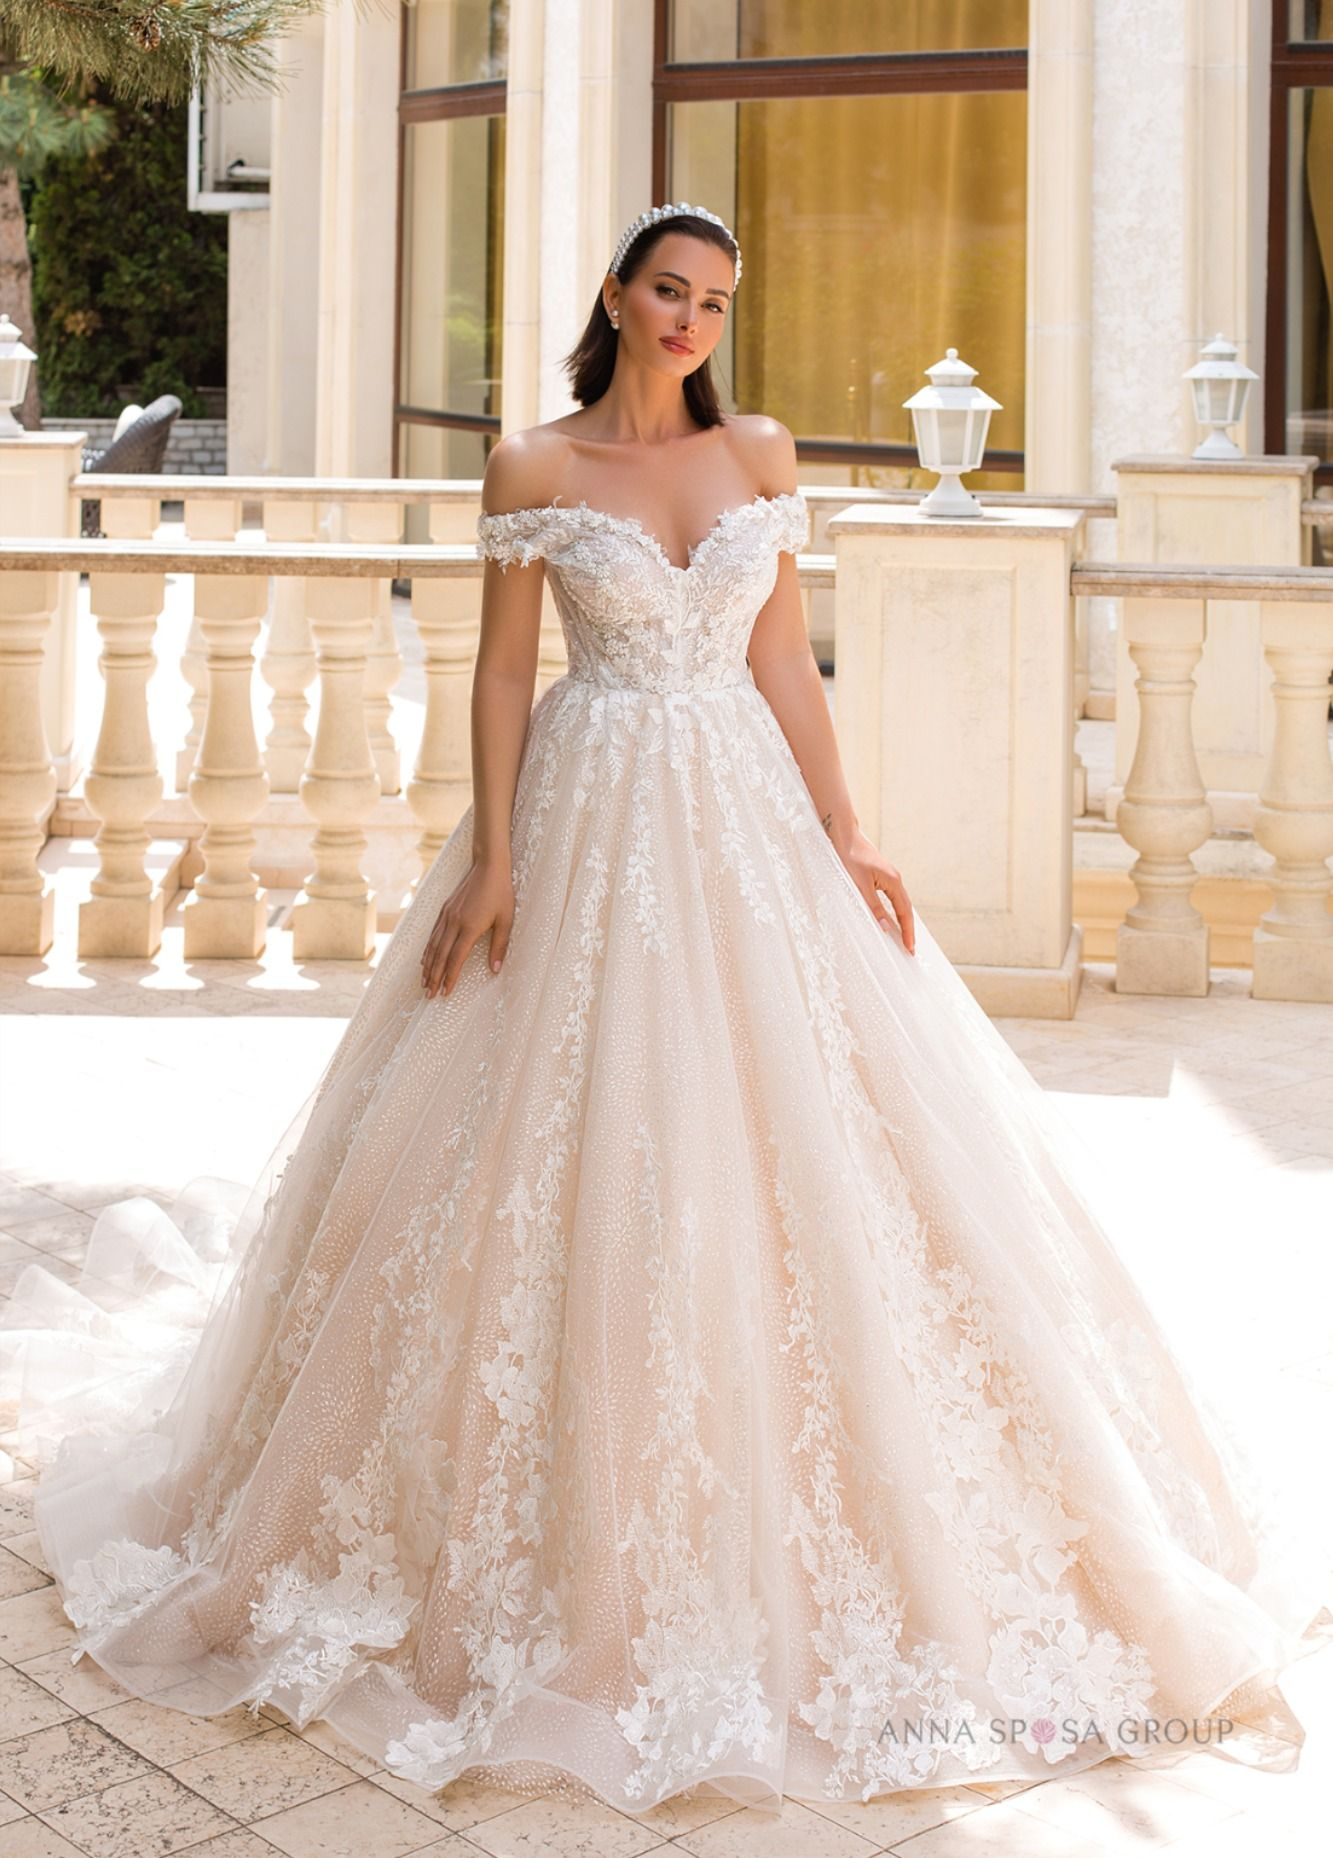 Perolla Wedding Dress Queen Inspired Collection Wedding Dresses Lace Ballgown Queen Wedding Dress Elegant Wedding Dress Ballgown [ 1858 x 1333 Pixel ]